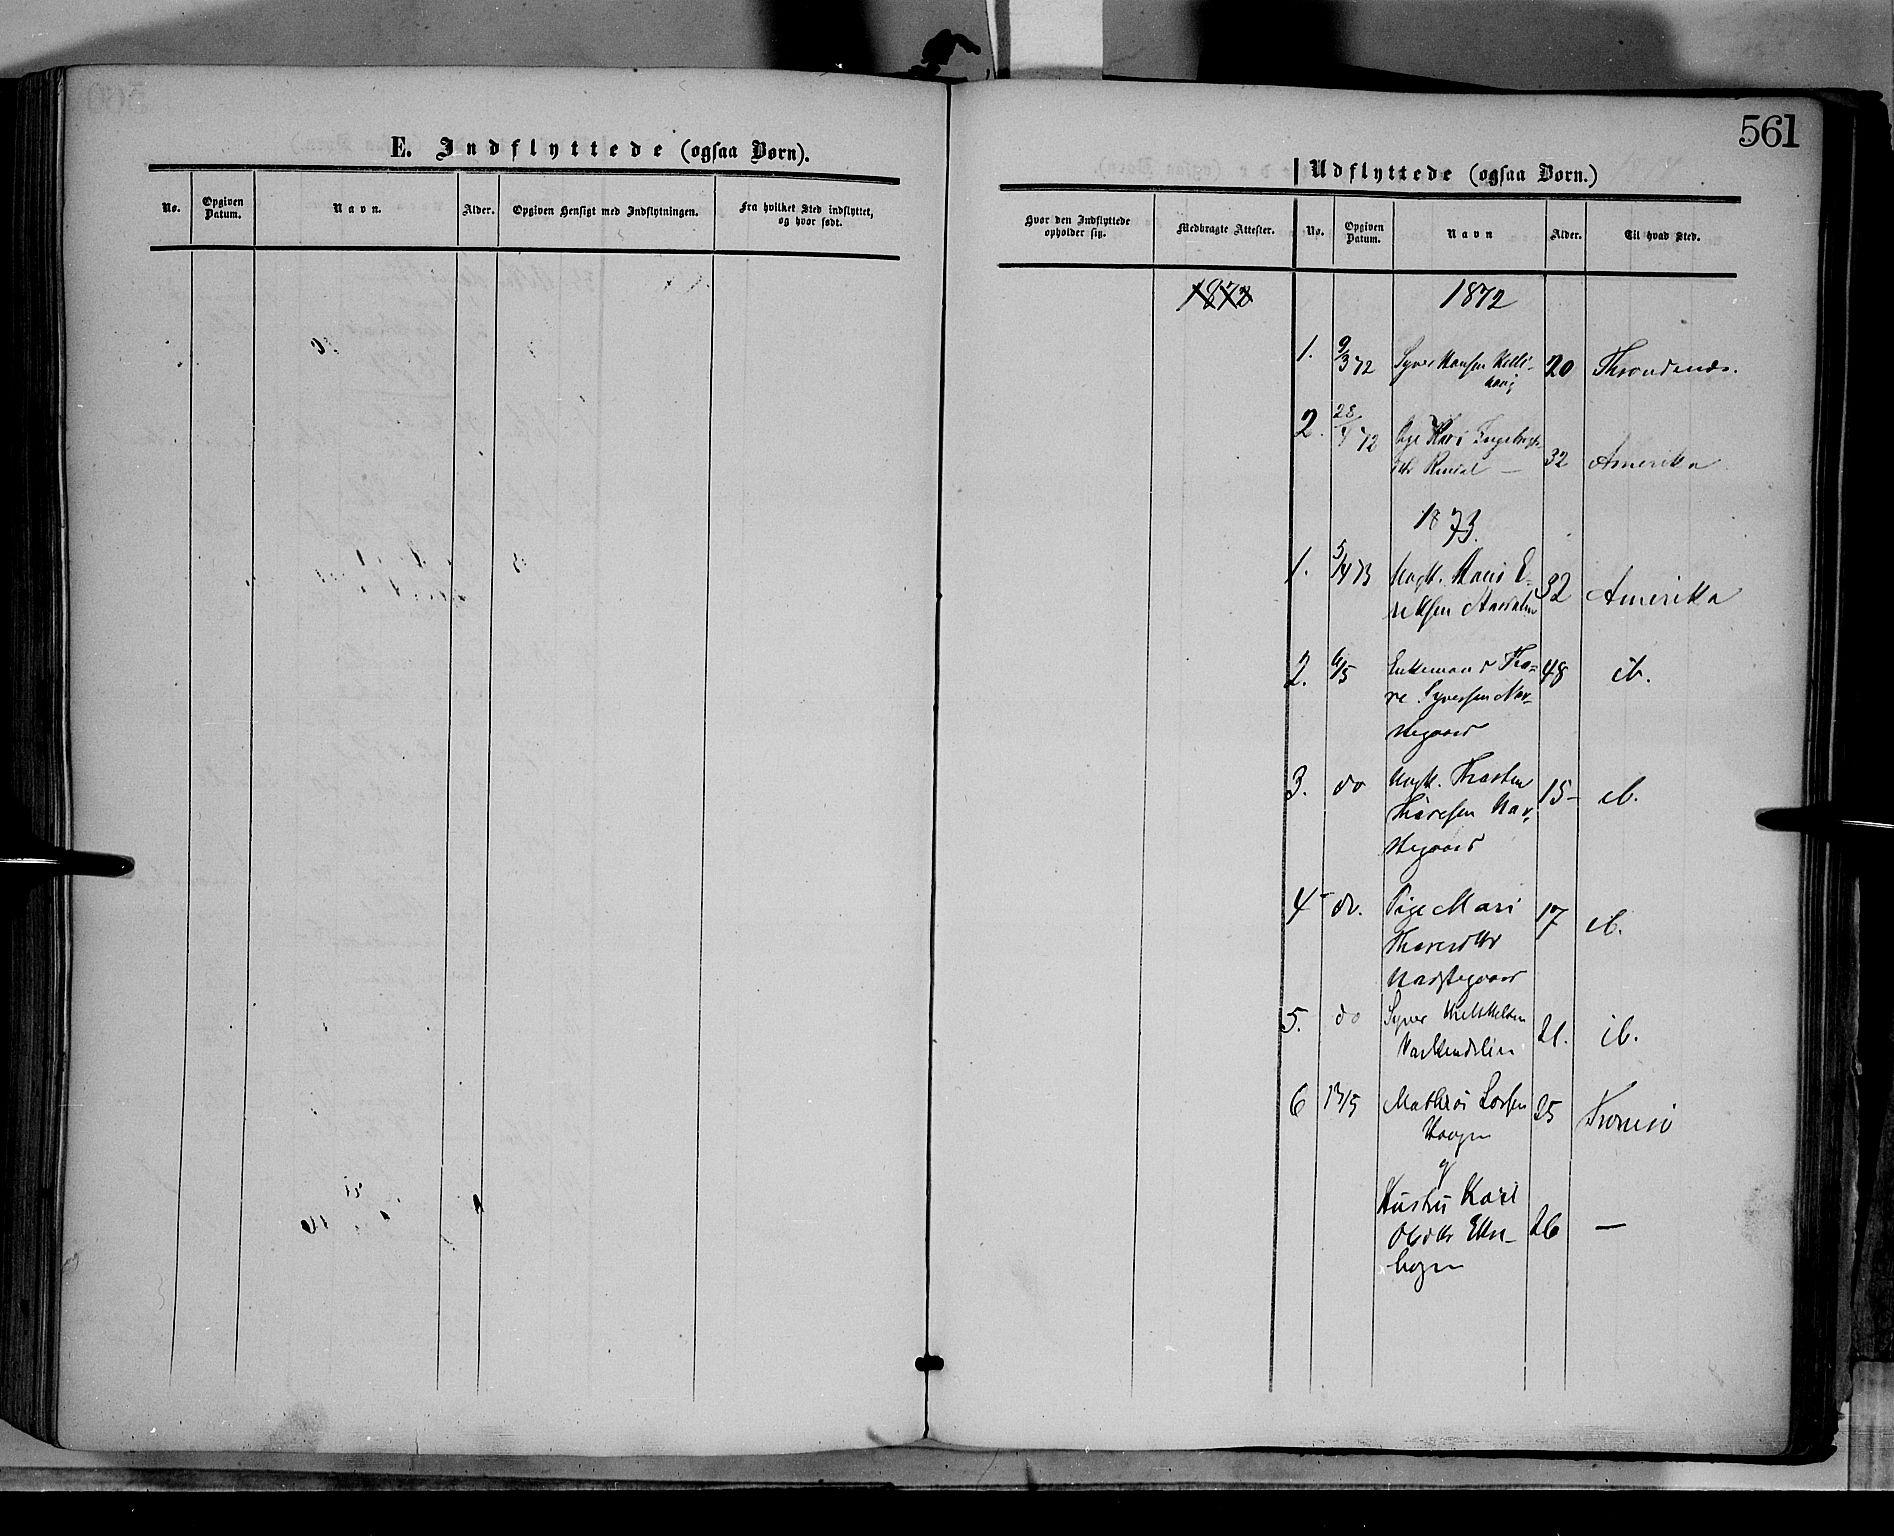 SAH, Dovre prestekontor, Ministerialbok nr. 1, 1854-1878, s. 561